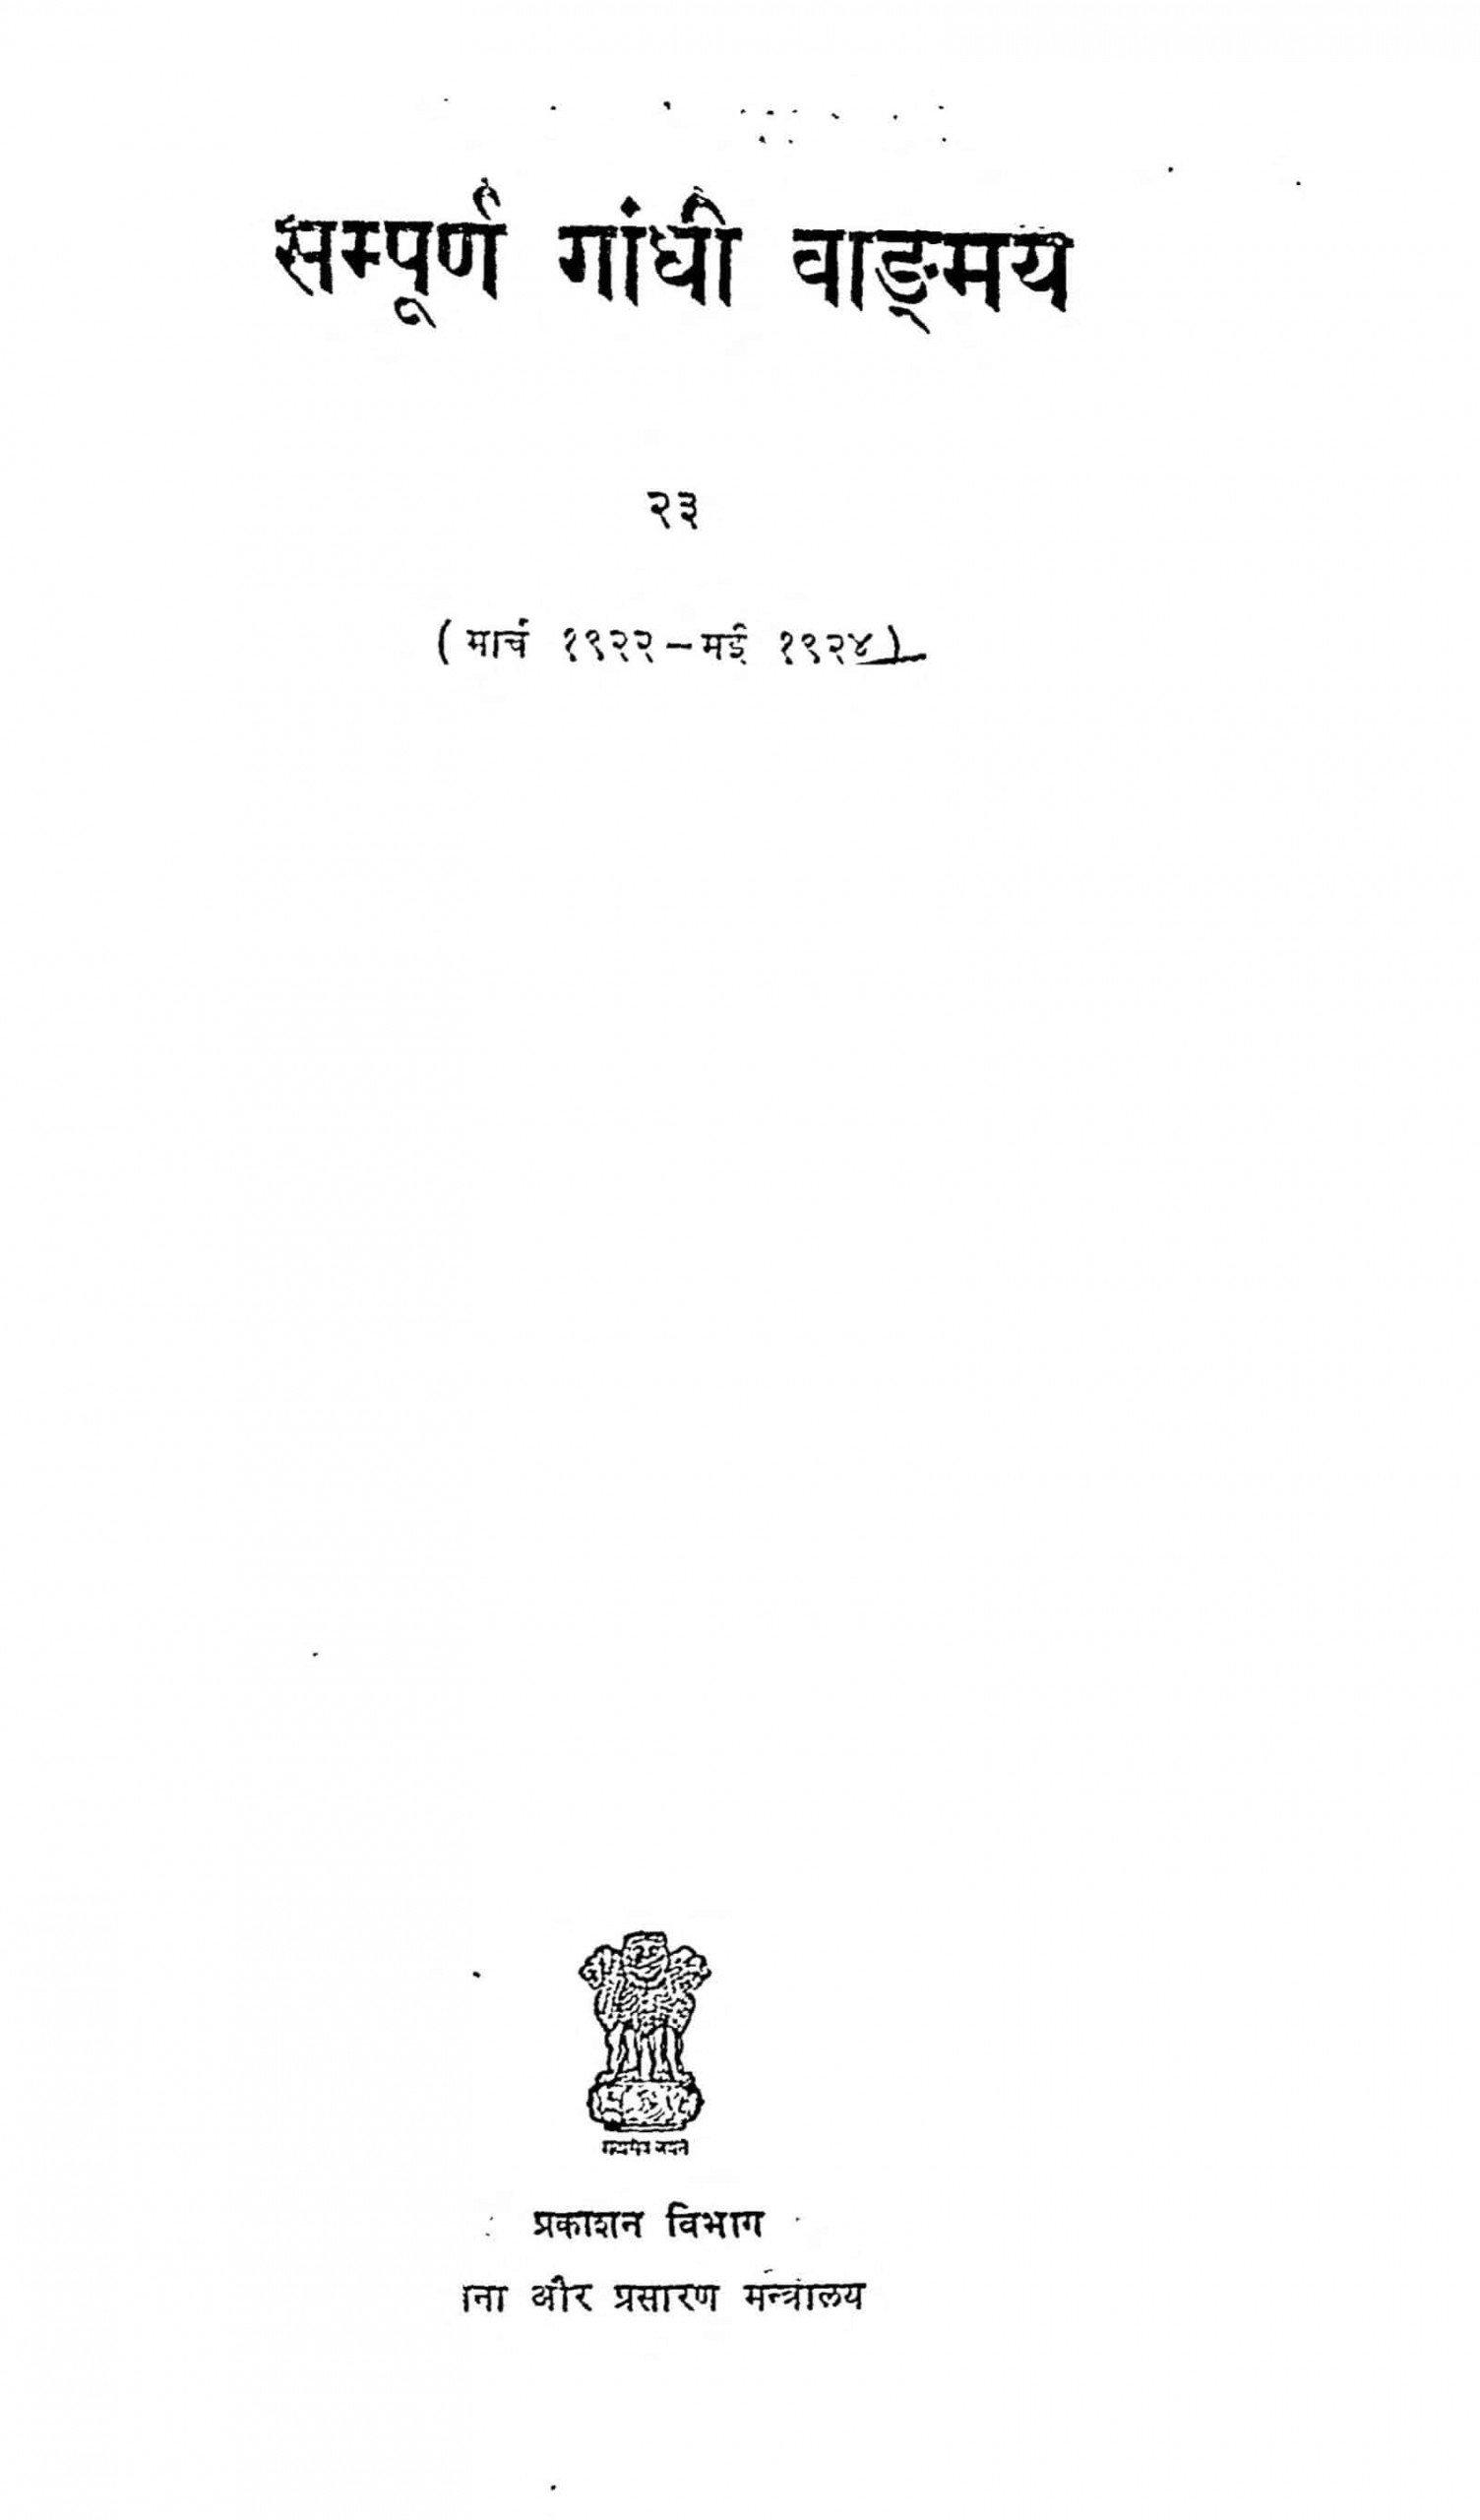 Book Image : सम्पूर्ण गांधी वाङ्मय भाग 23 - Sampuran Gandhi Vangmay Bhag 23